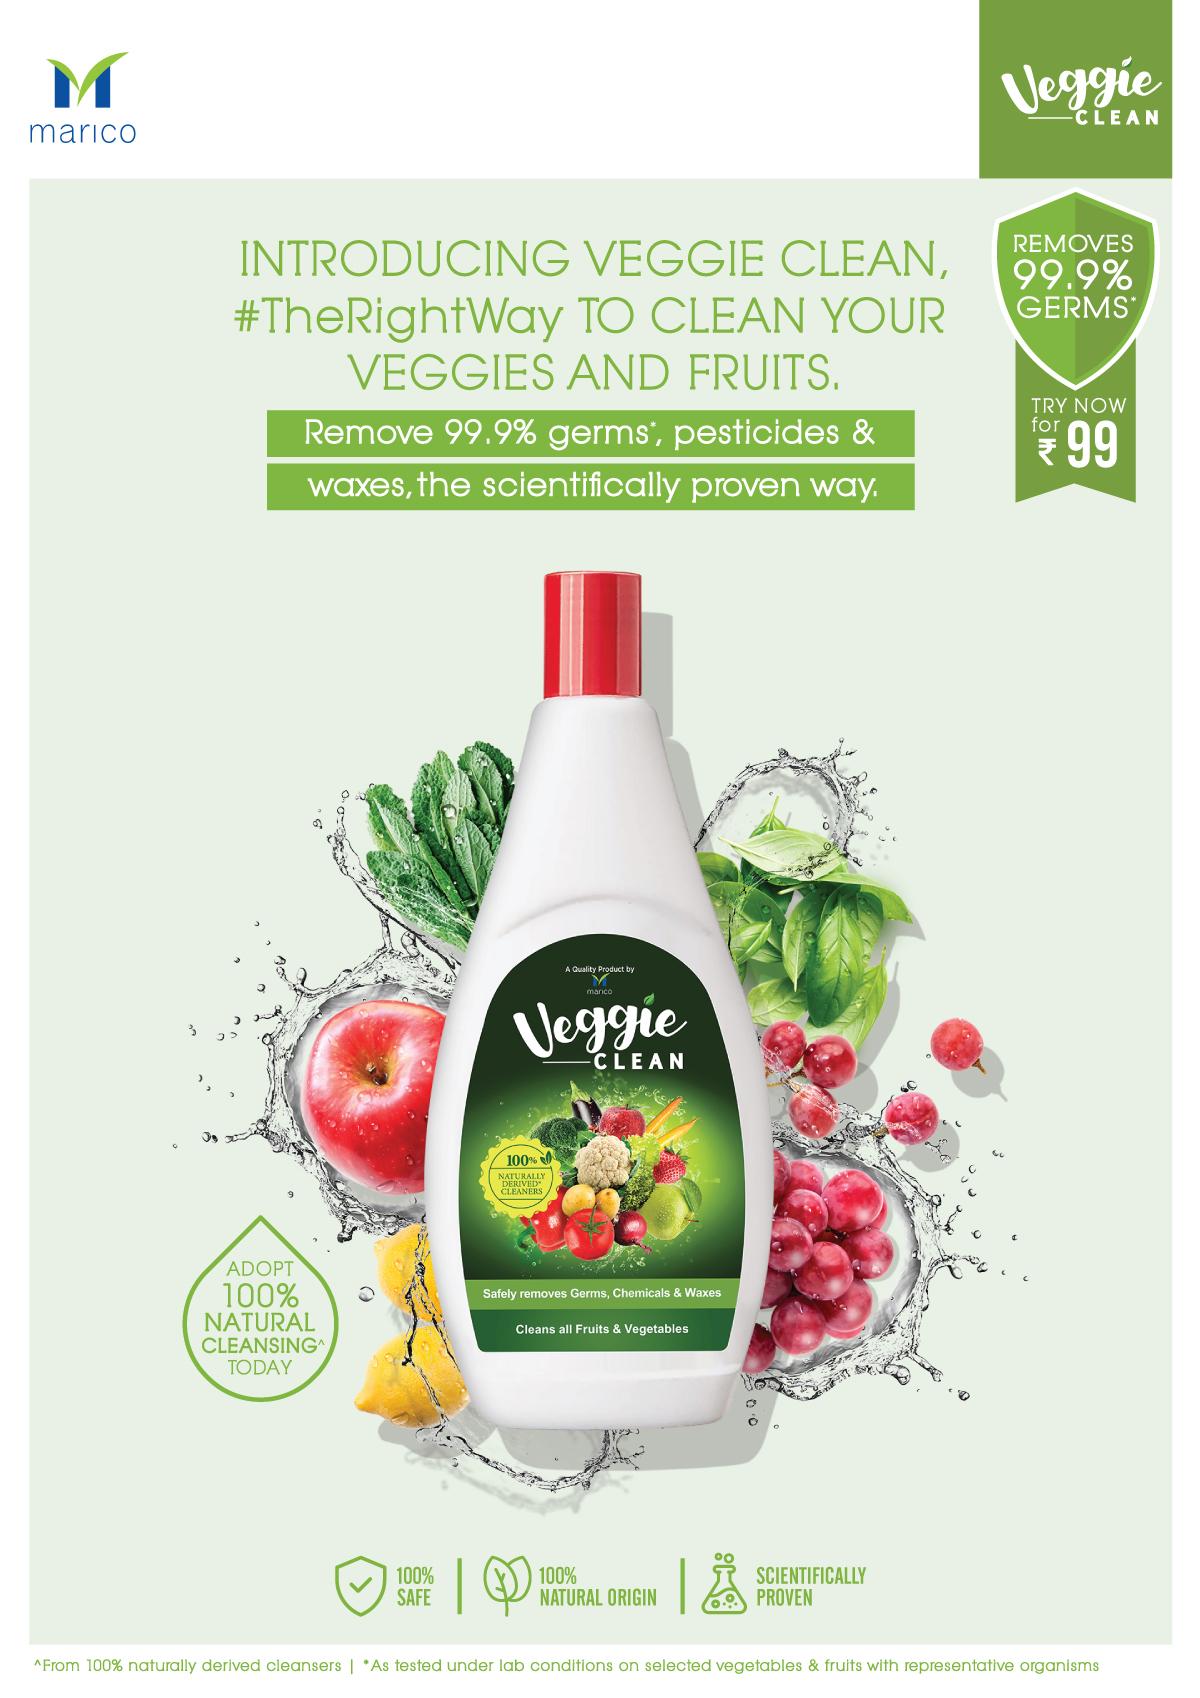 Veggie-Clean_A4-Size-Poster-Design (2)